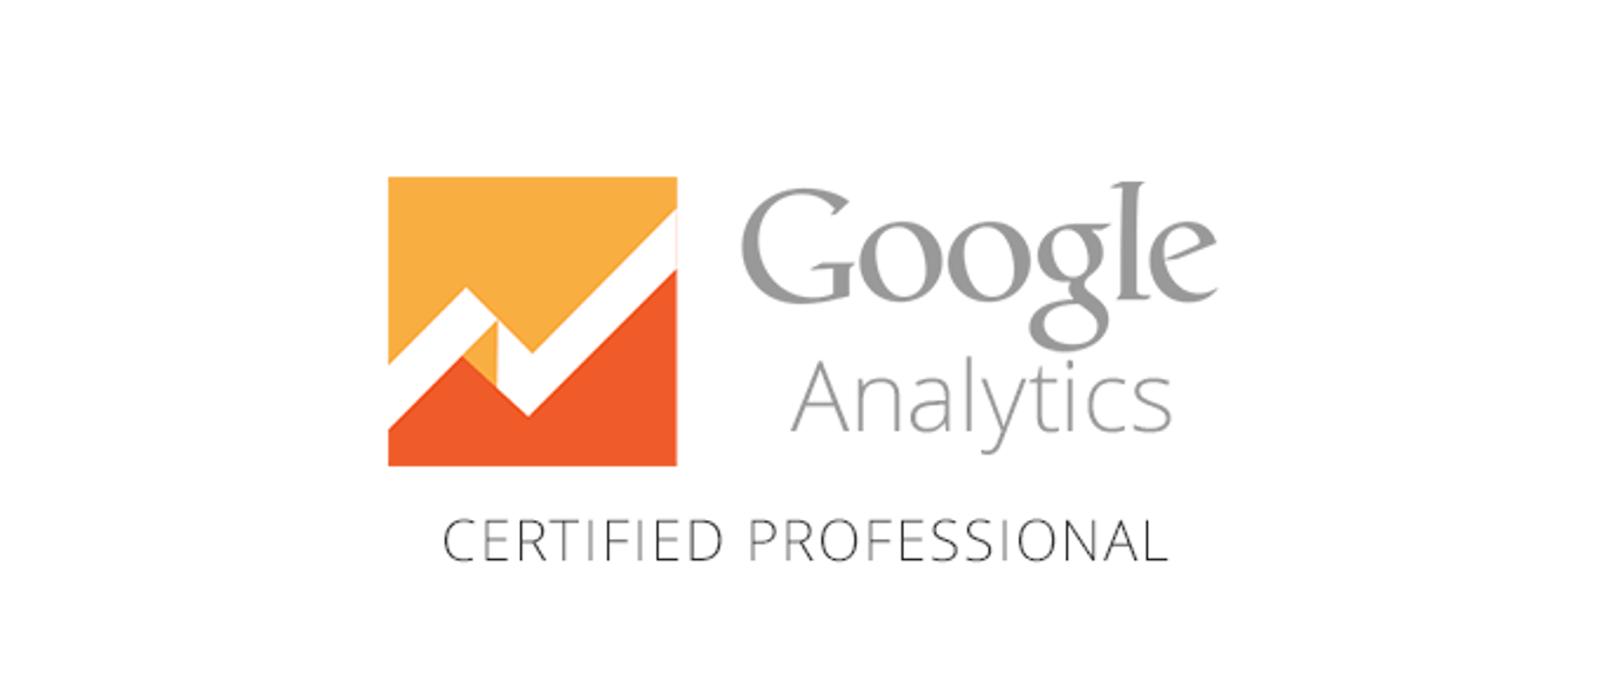 The Google Analytics Certification Dashthis